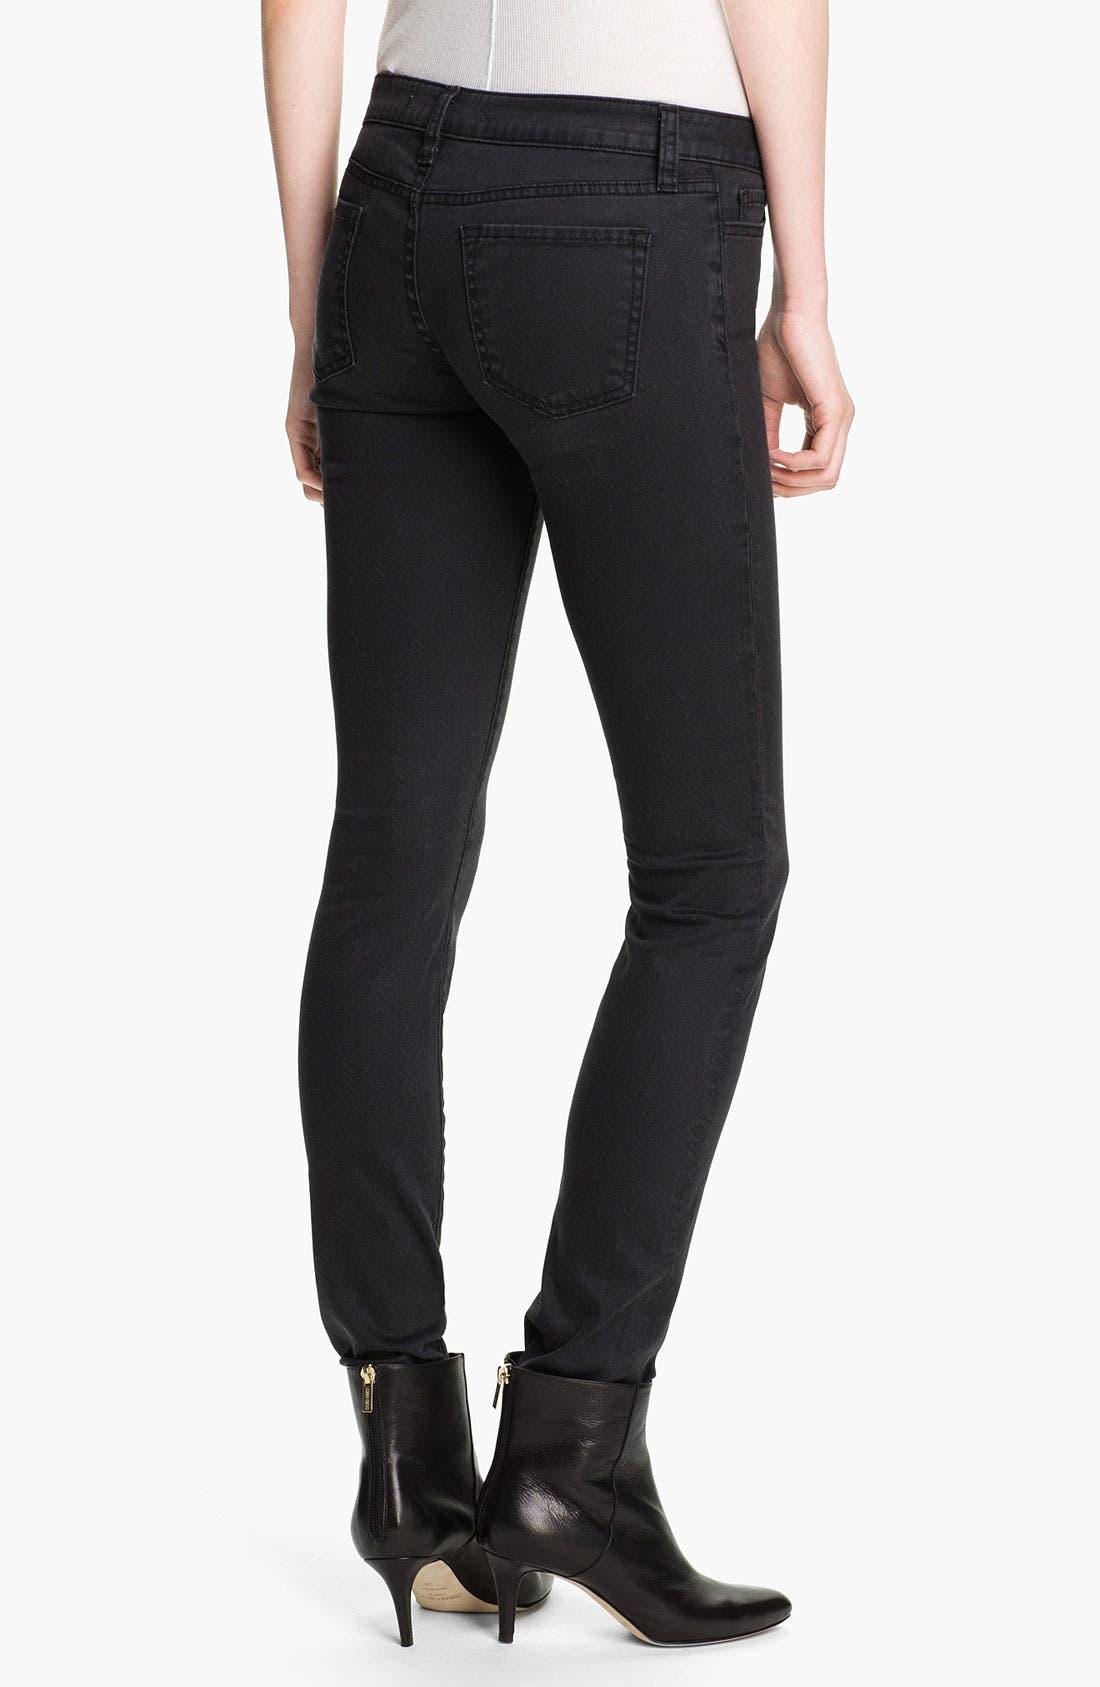 Alternate Image 2  - Vince Print Stretch Skinny Jeans (Charcoal Herringbone)